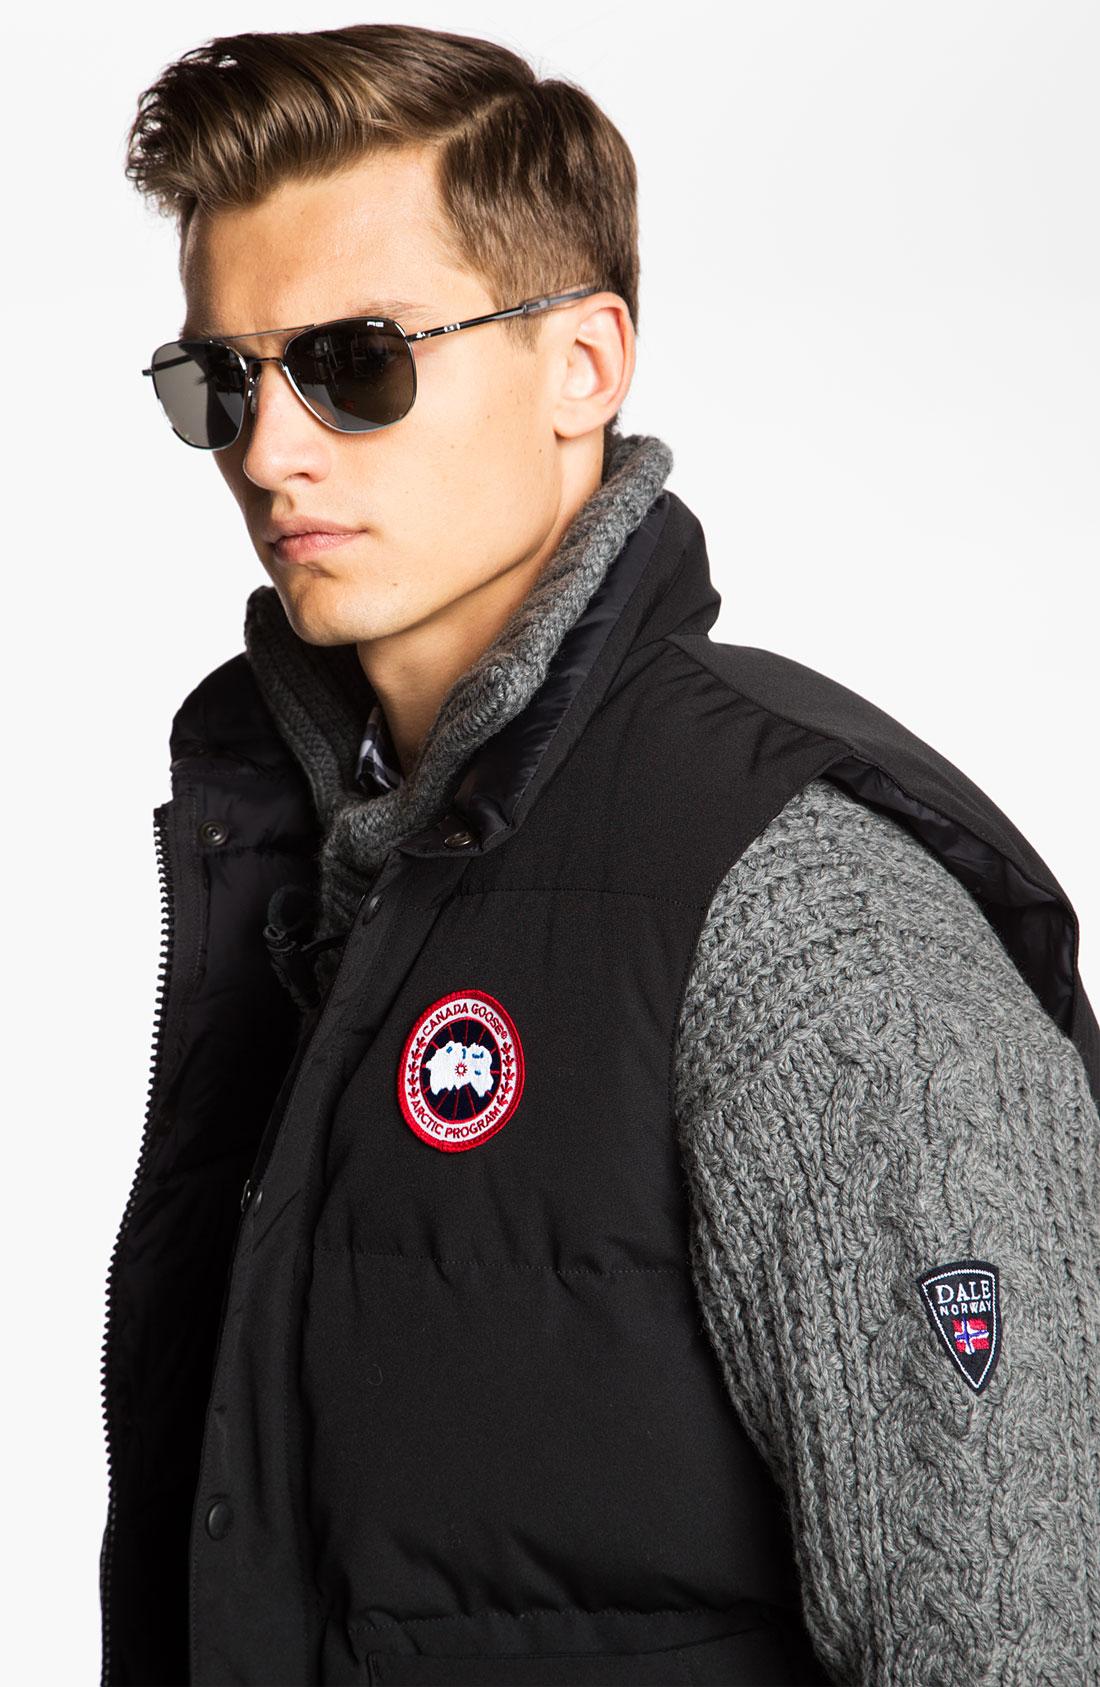 Canada Goose victoria parka replica cheap - Canada goose Freestyle Vest in Black for Men | Lyst